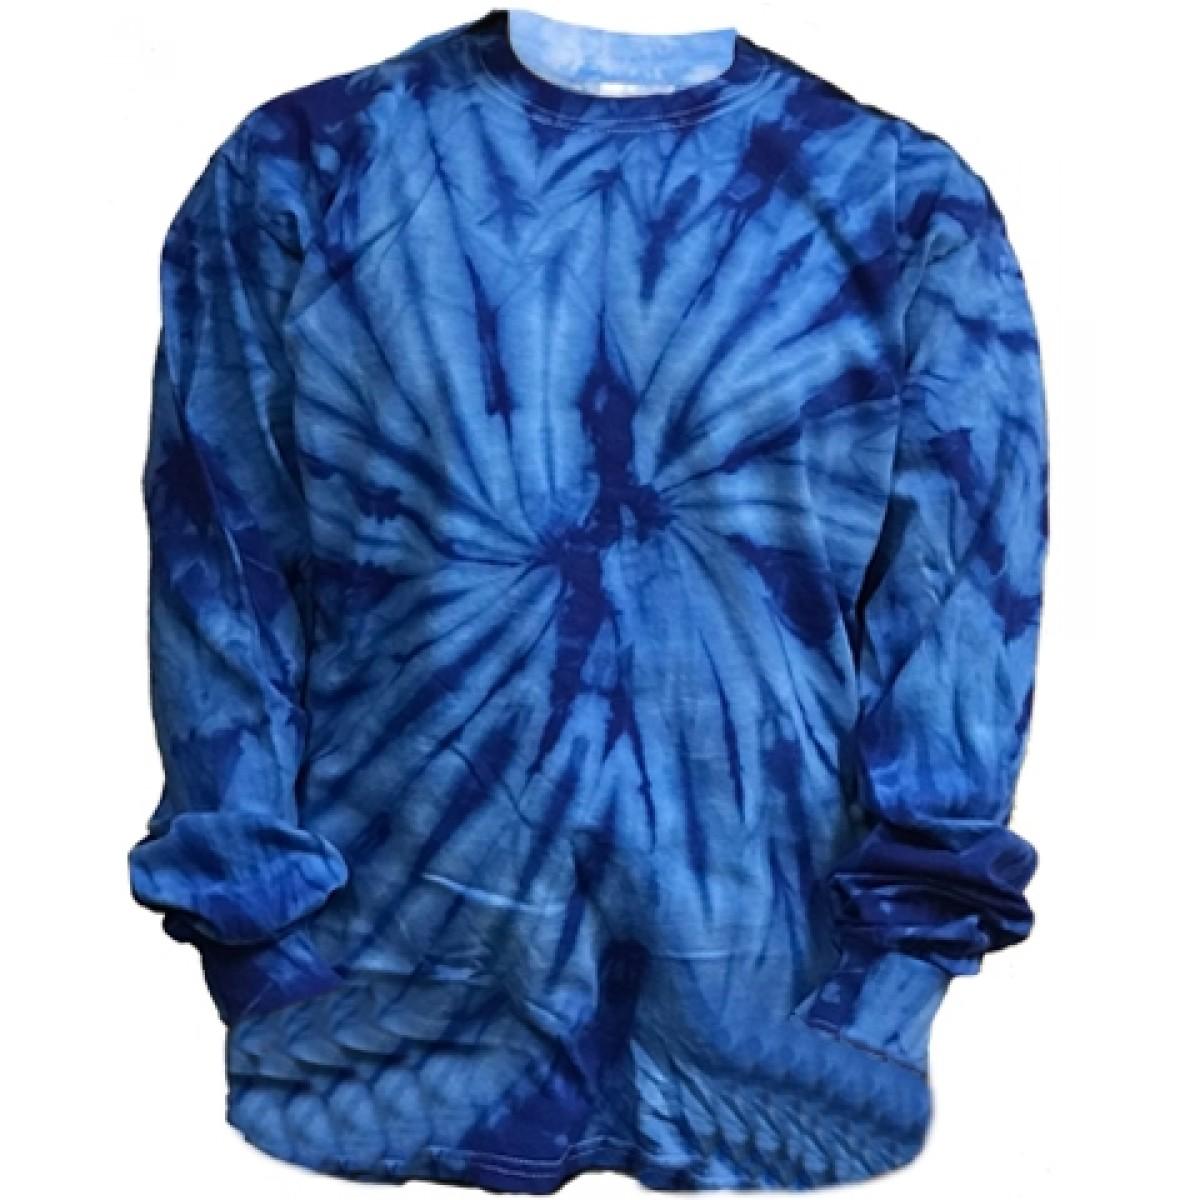 Cotton Long Sleeve T-Shirt / Tie Dye Blue